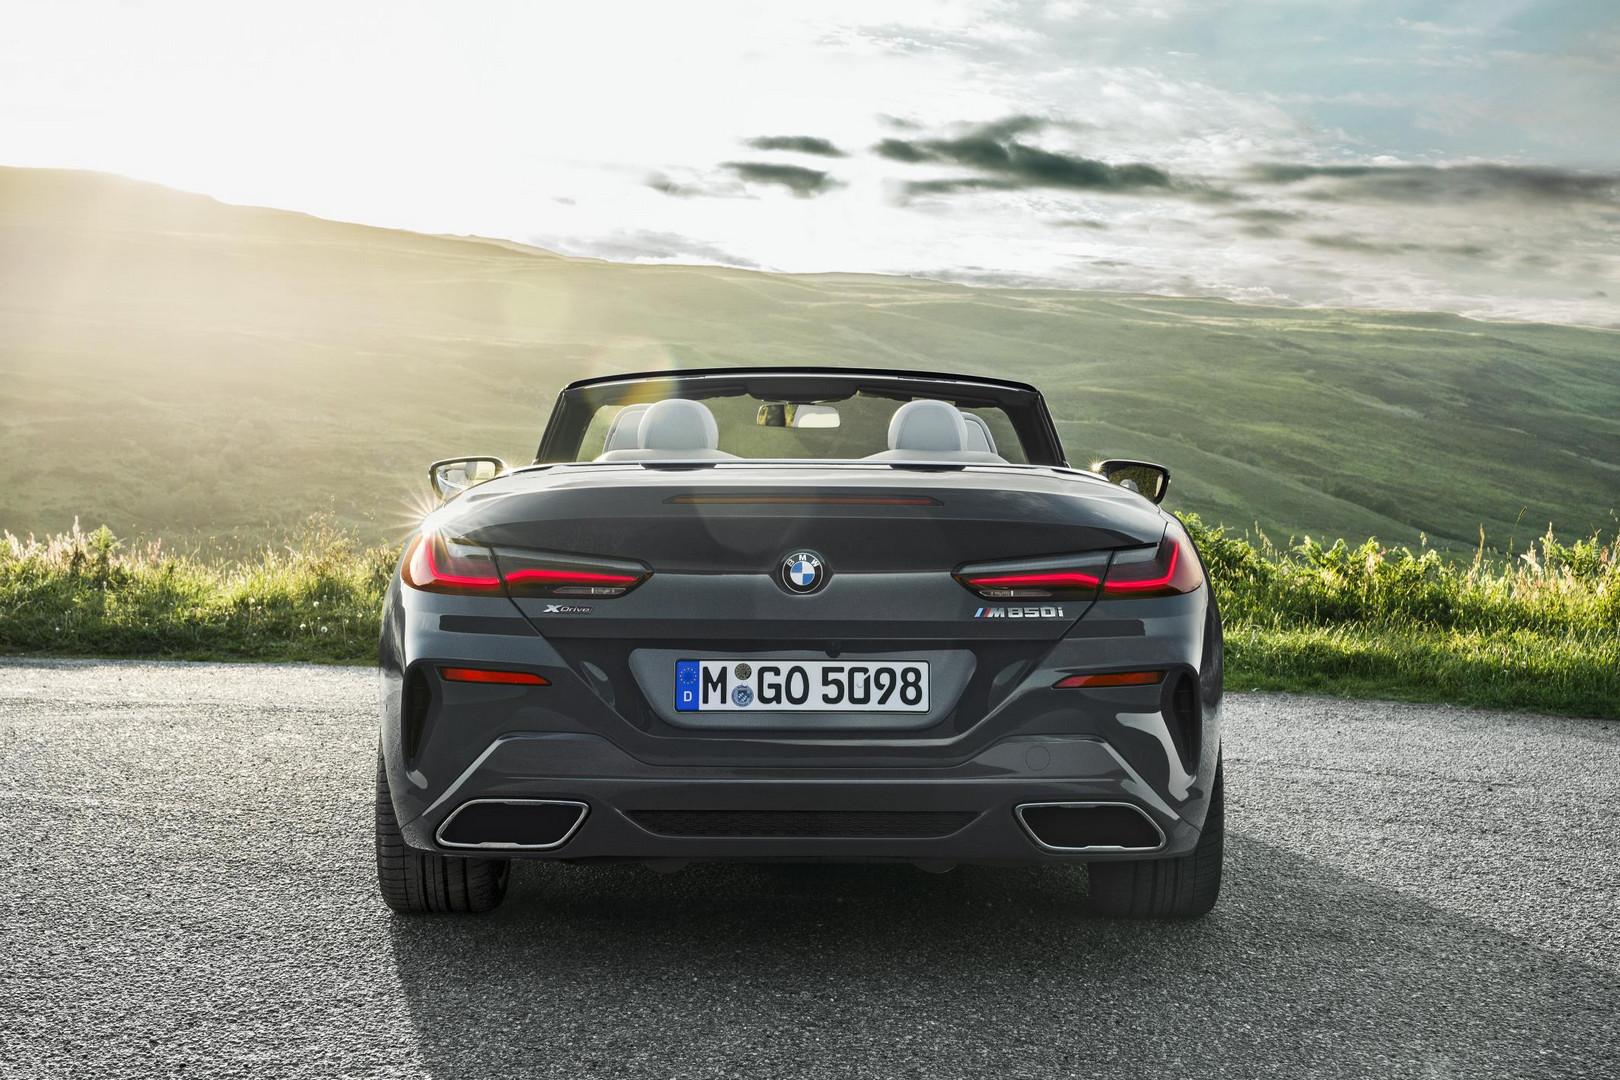 2019 BMW 8 Series Convertible Rear View